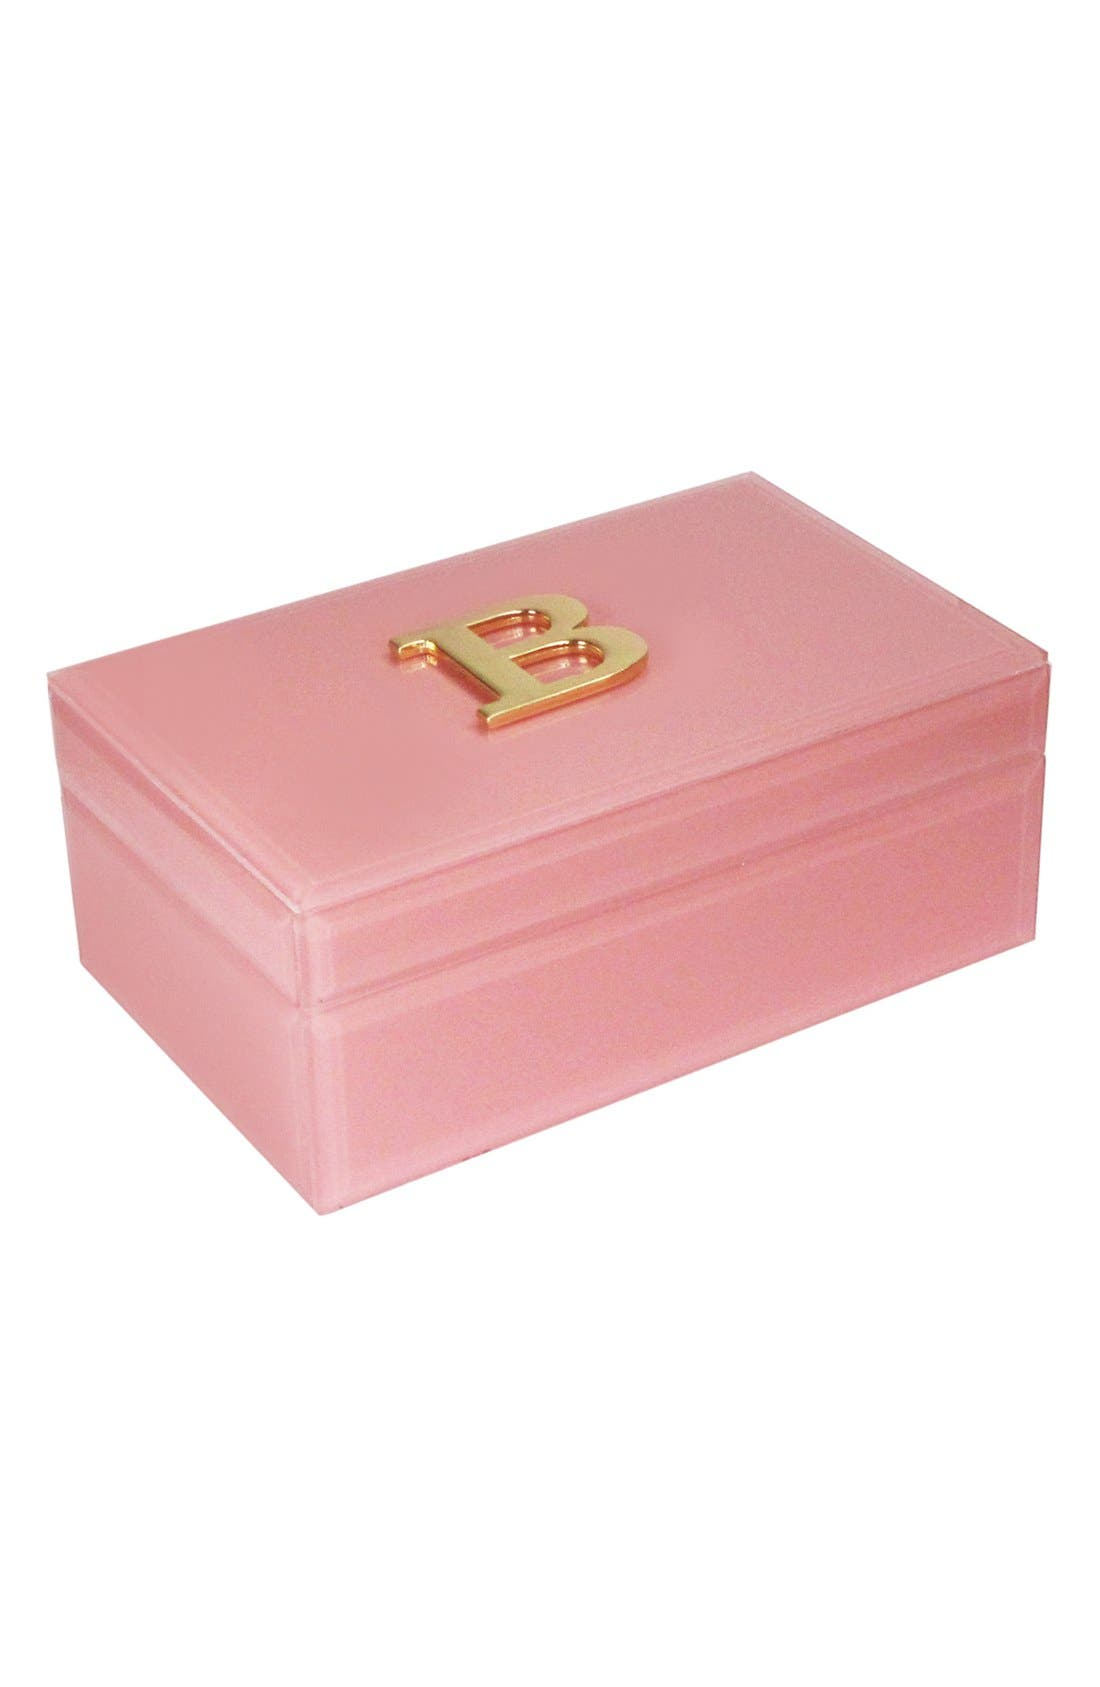 Monogram Jewelry Box,                         Main,                         color, Rose - B